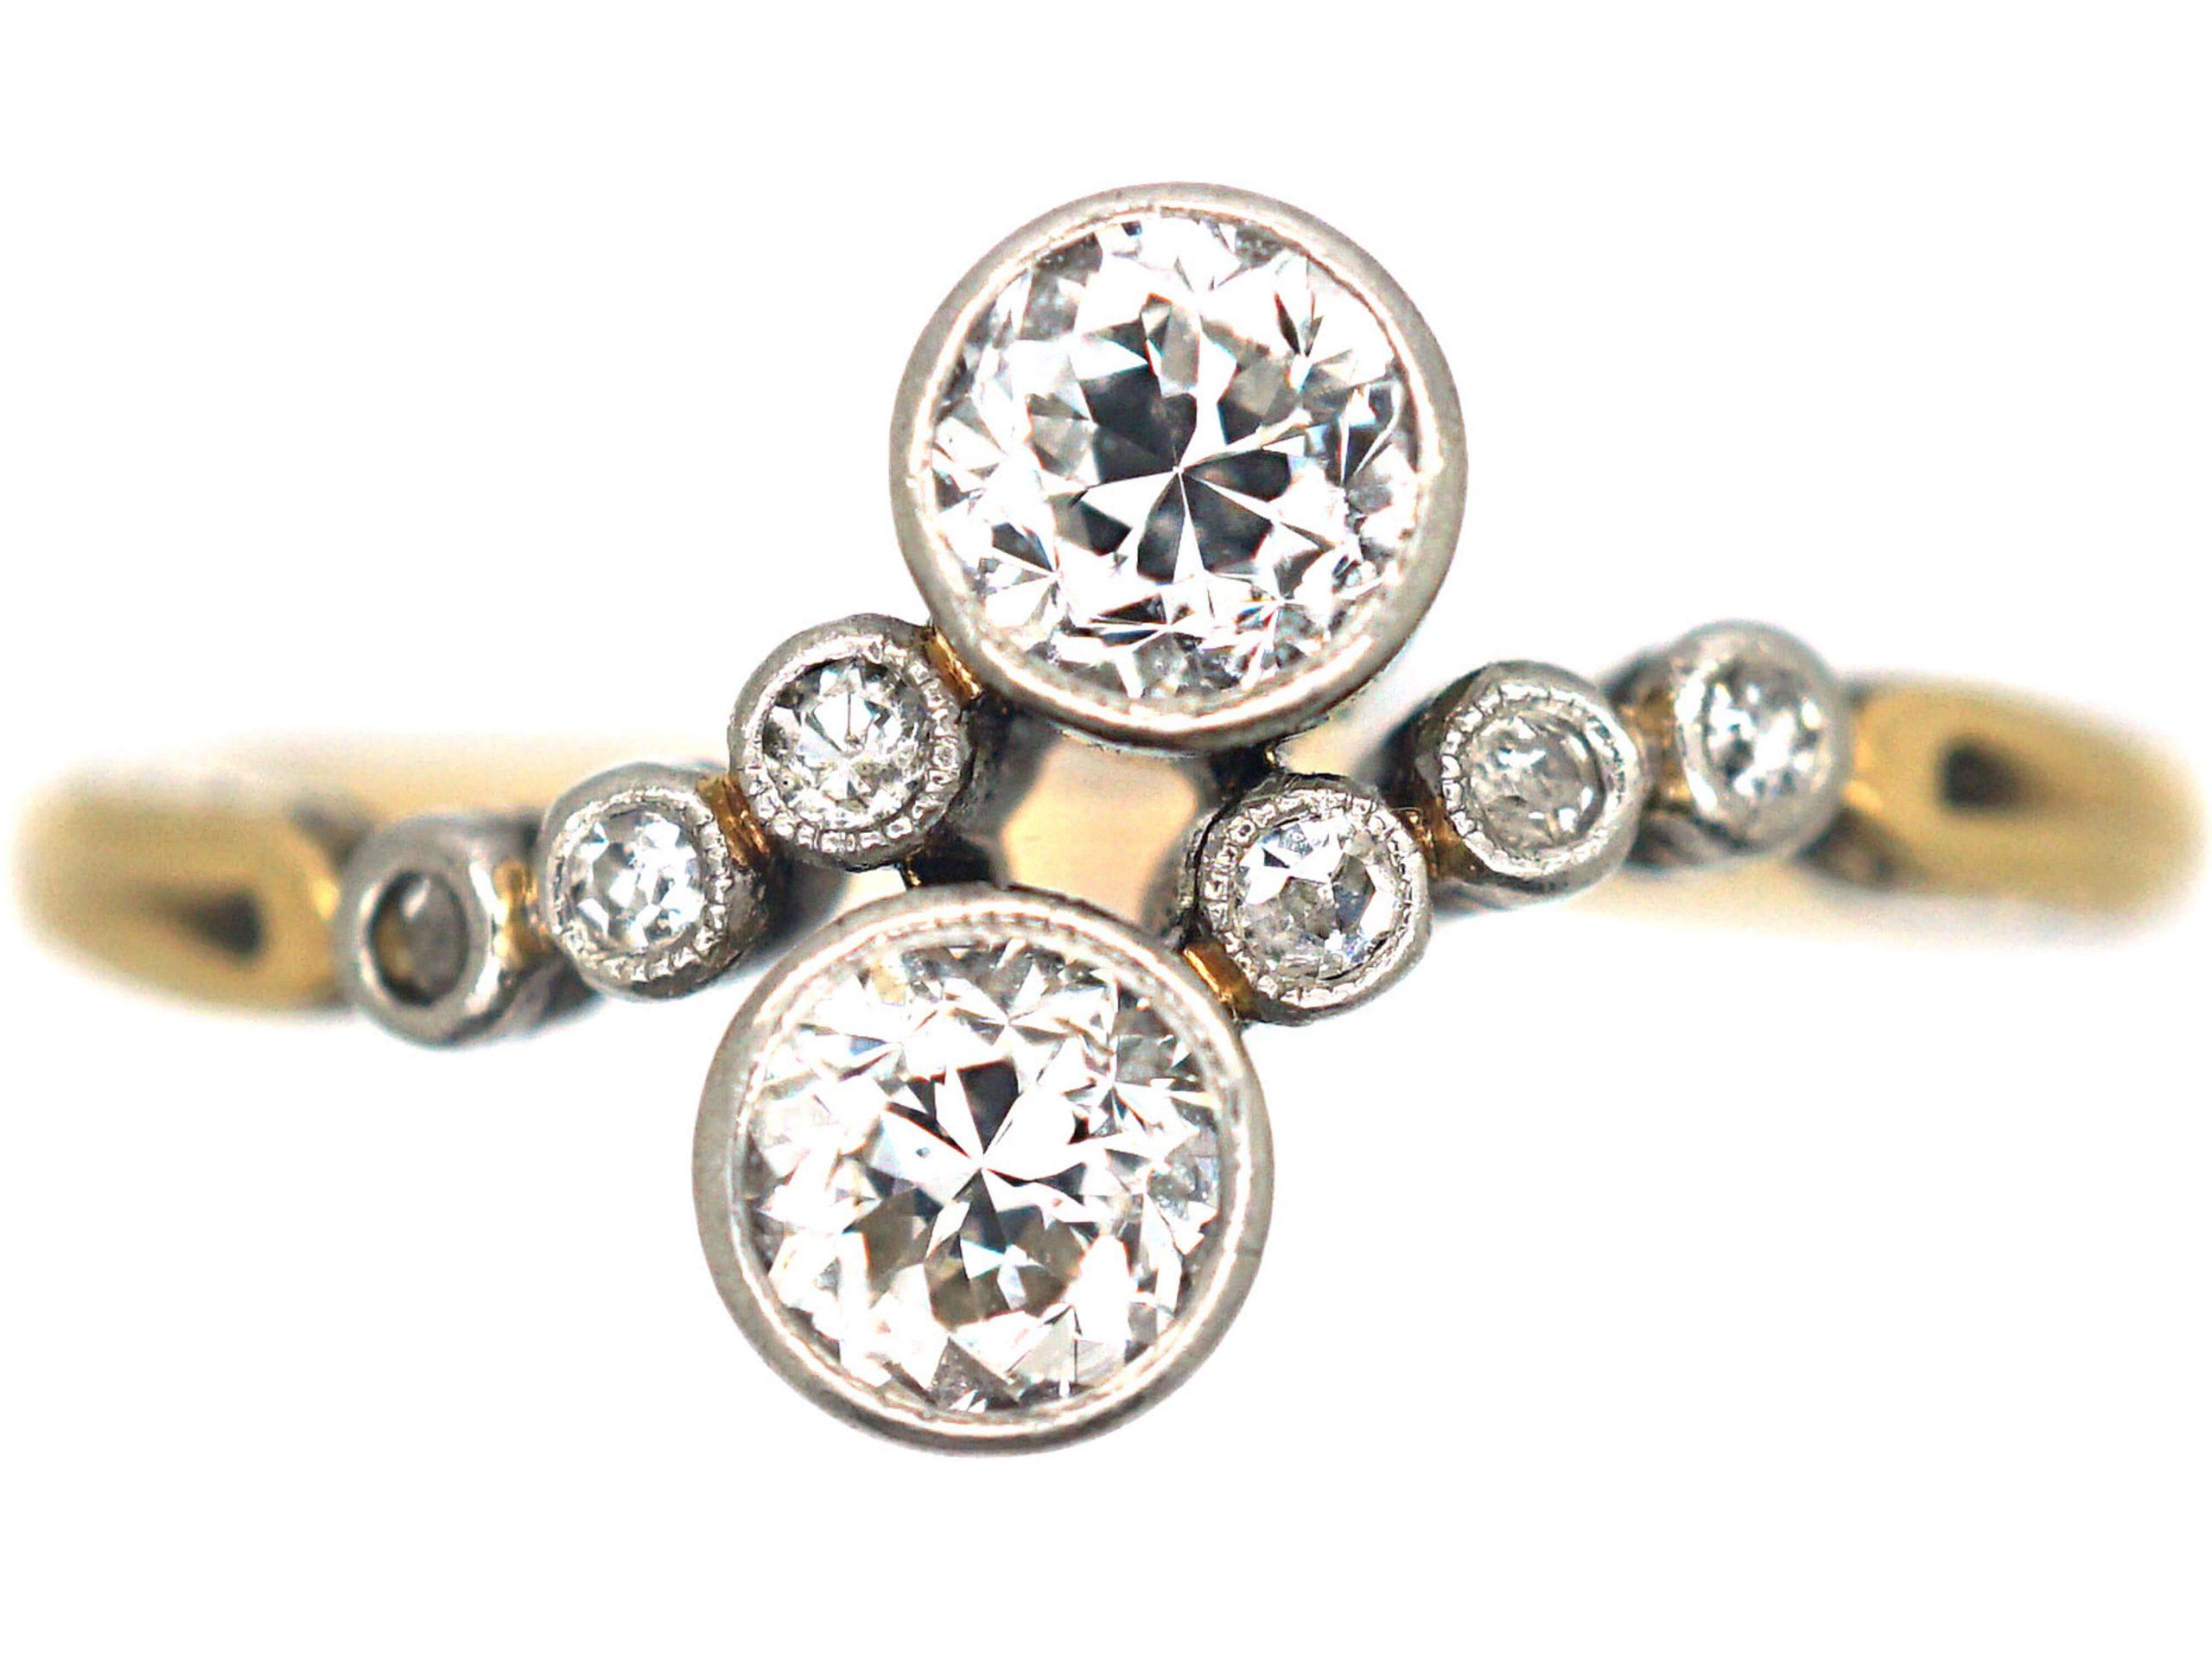 Edwardian 14ct Gold, Platinum & Diamond Crossover Ring